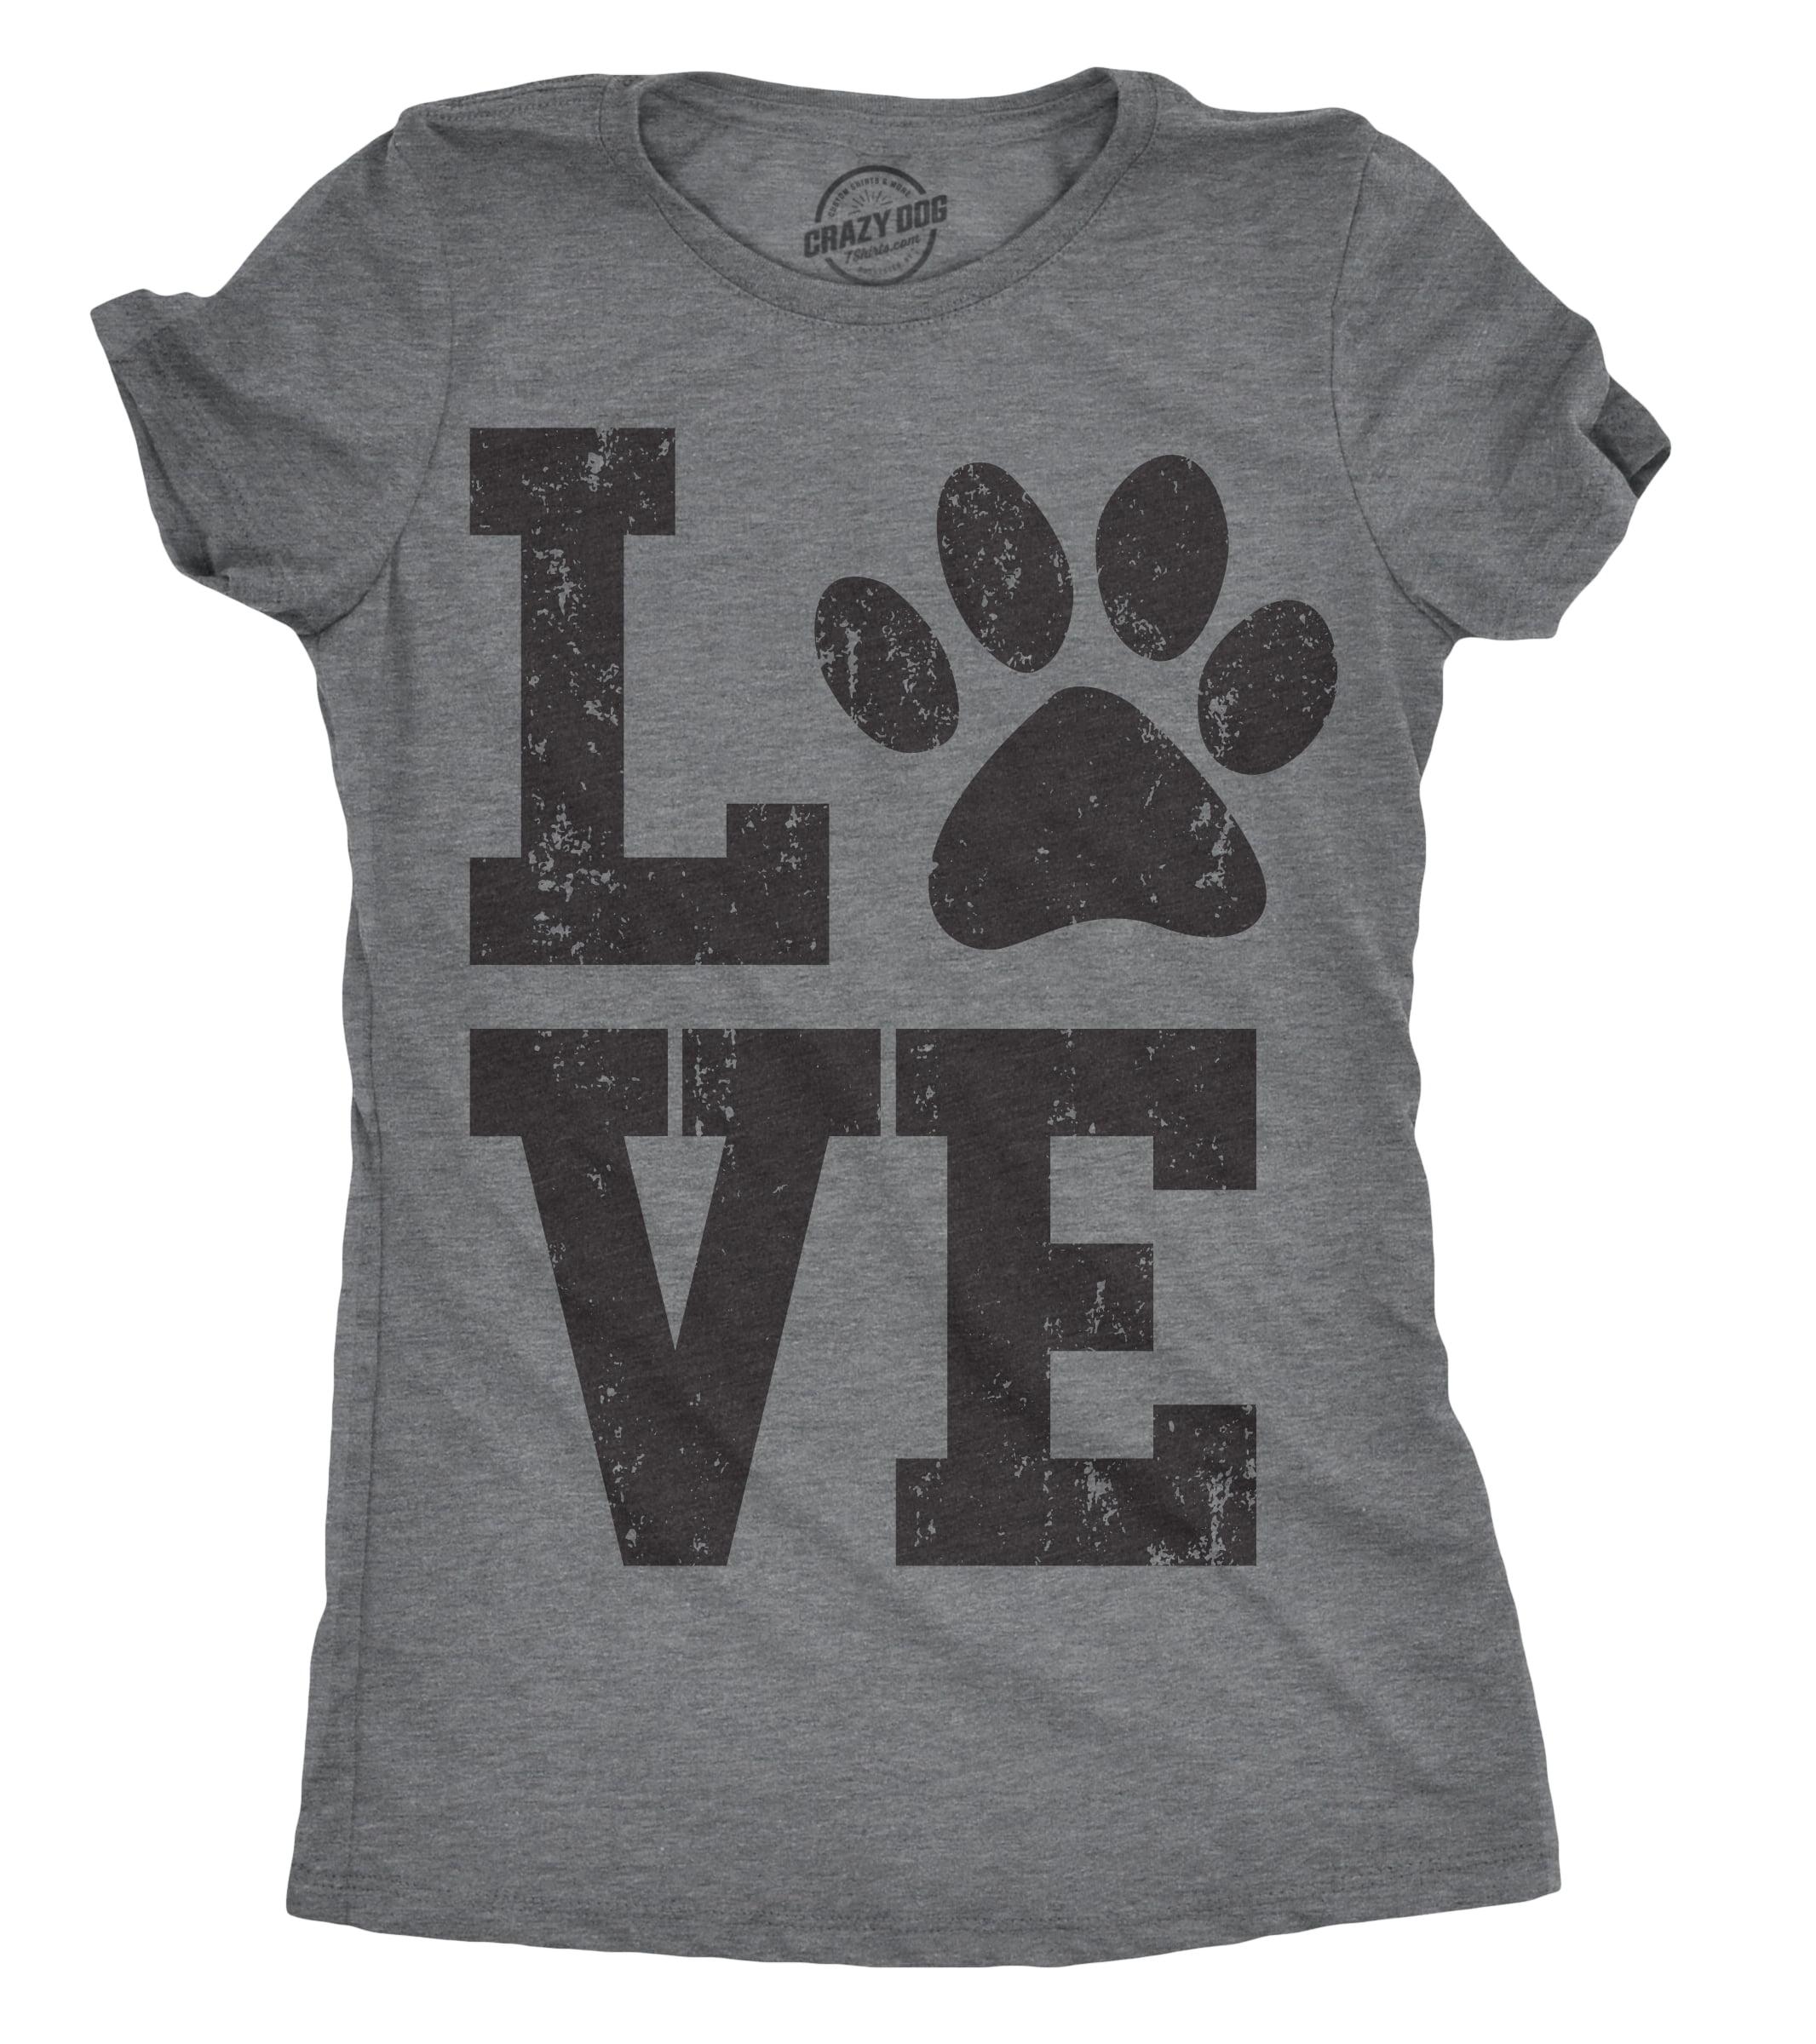 Dog Mom Shirt Women Funny Dog Paw Cute Printed Tee Shirt Tank Tops Blouse